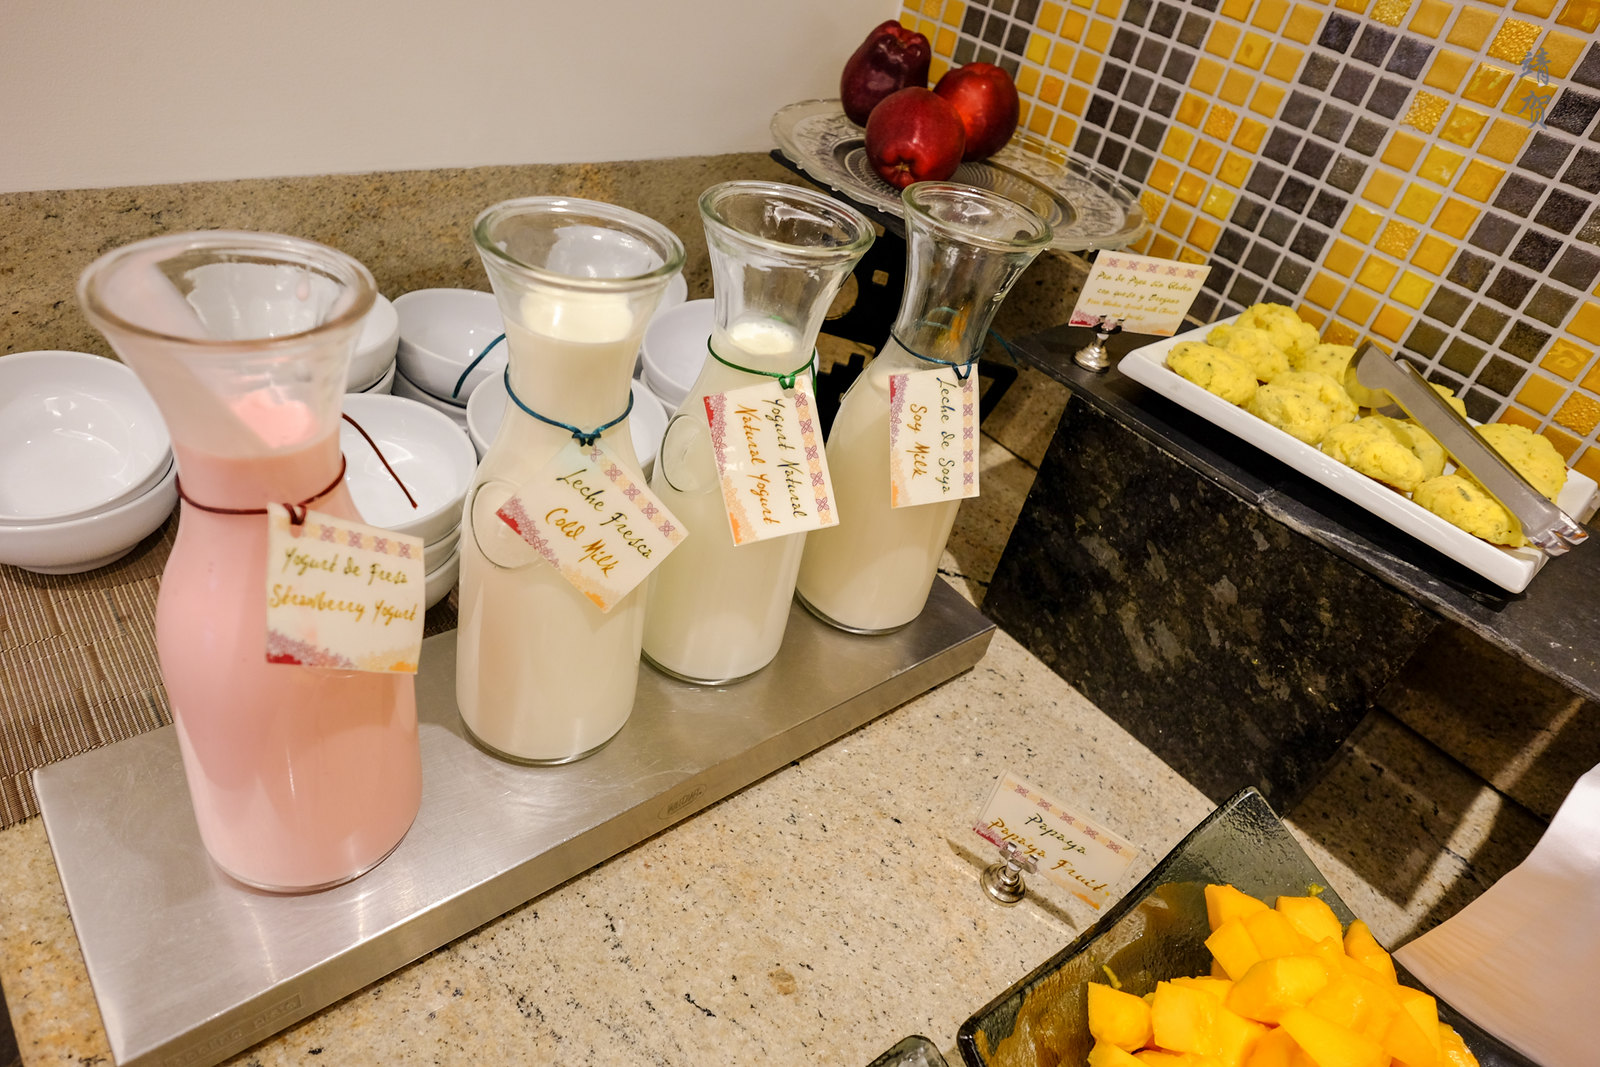 Yogurt and milk